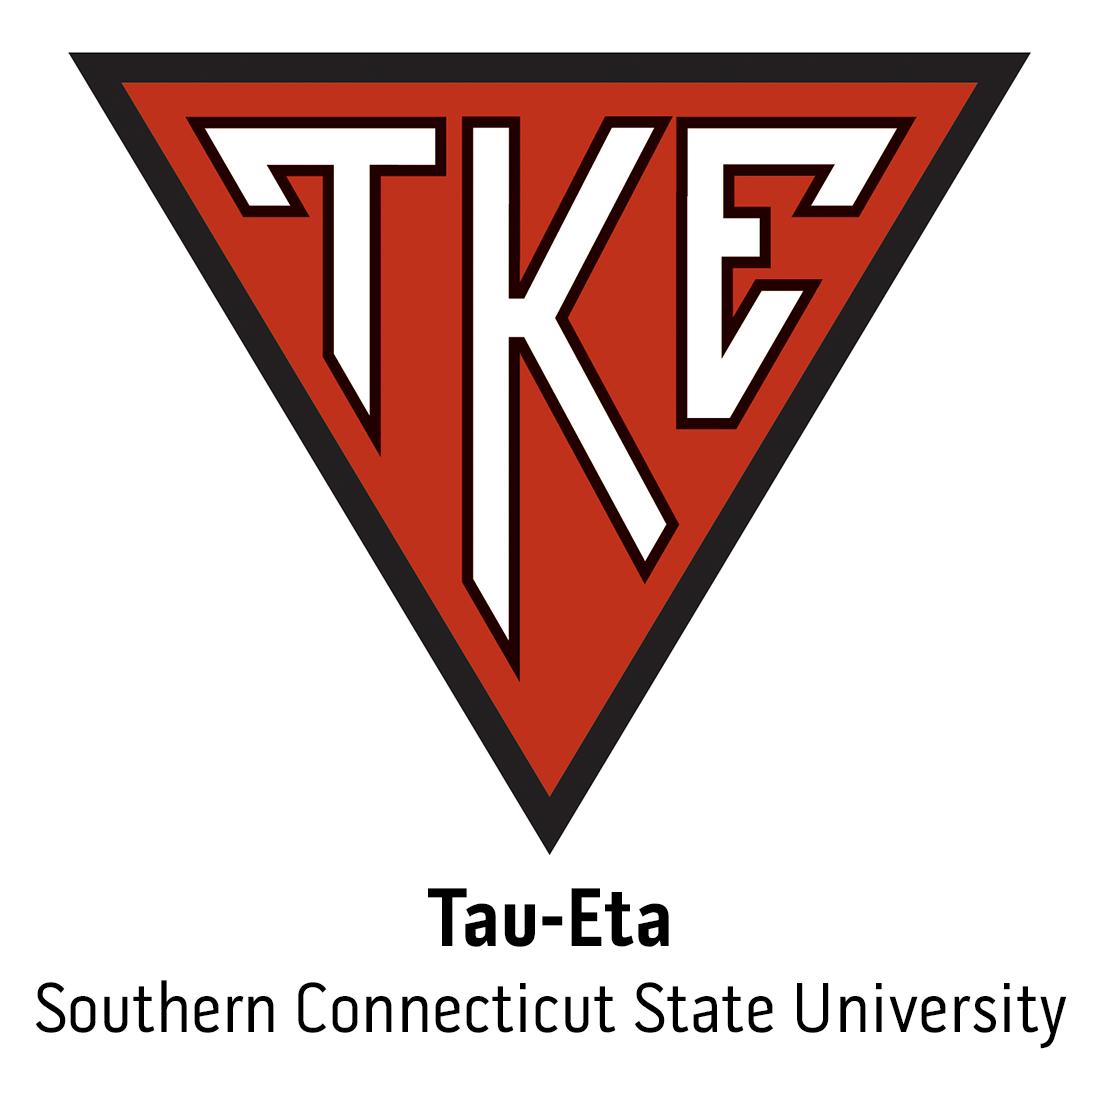 Tau-Eta Chapter at Southern Connecticut State University